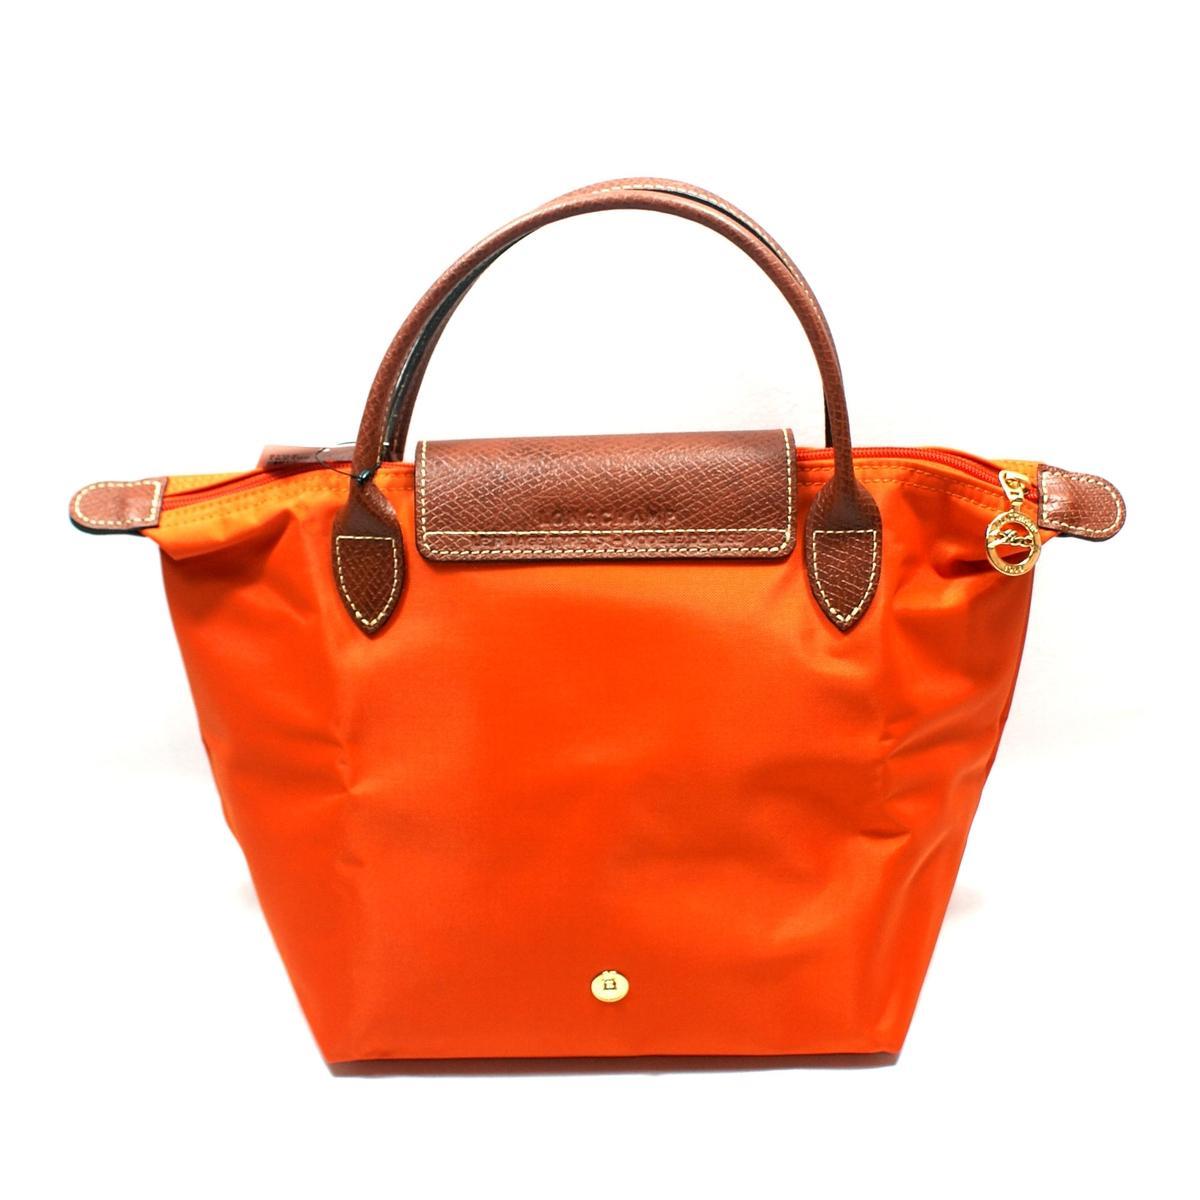 Longchamp Le Place Mini Duffle Tote Bag Orange 1621089217